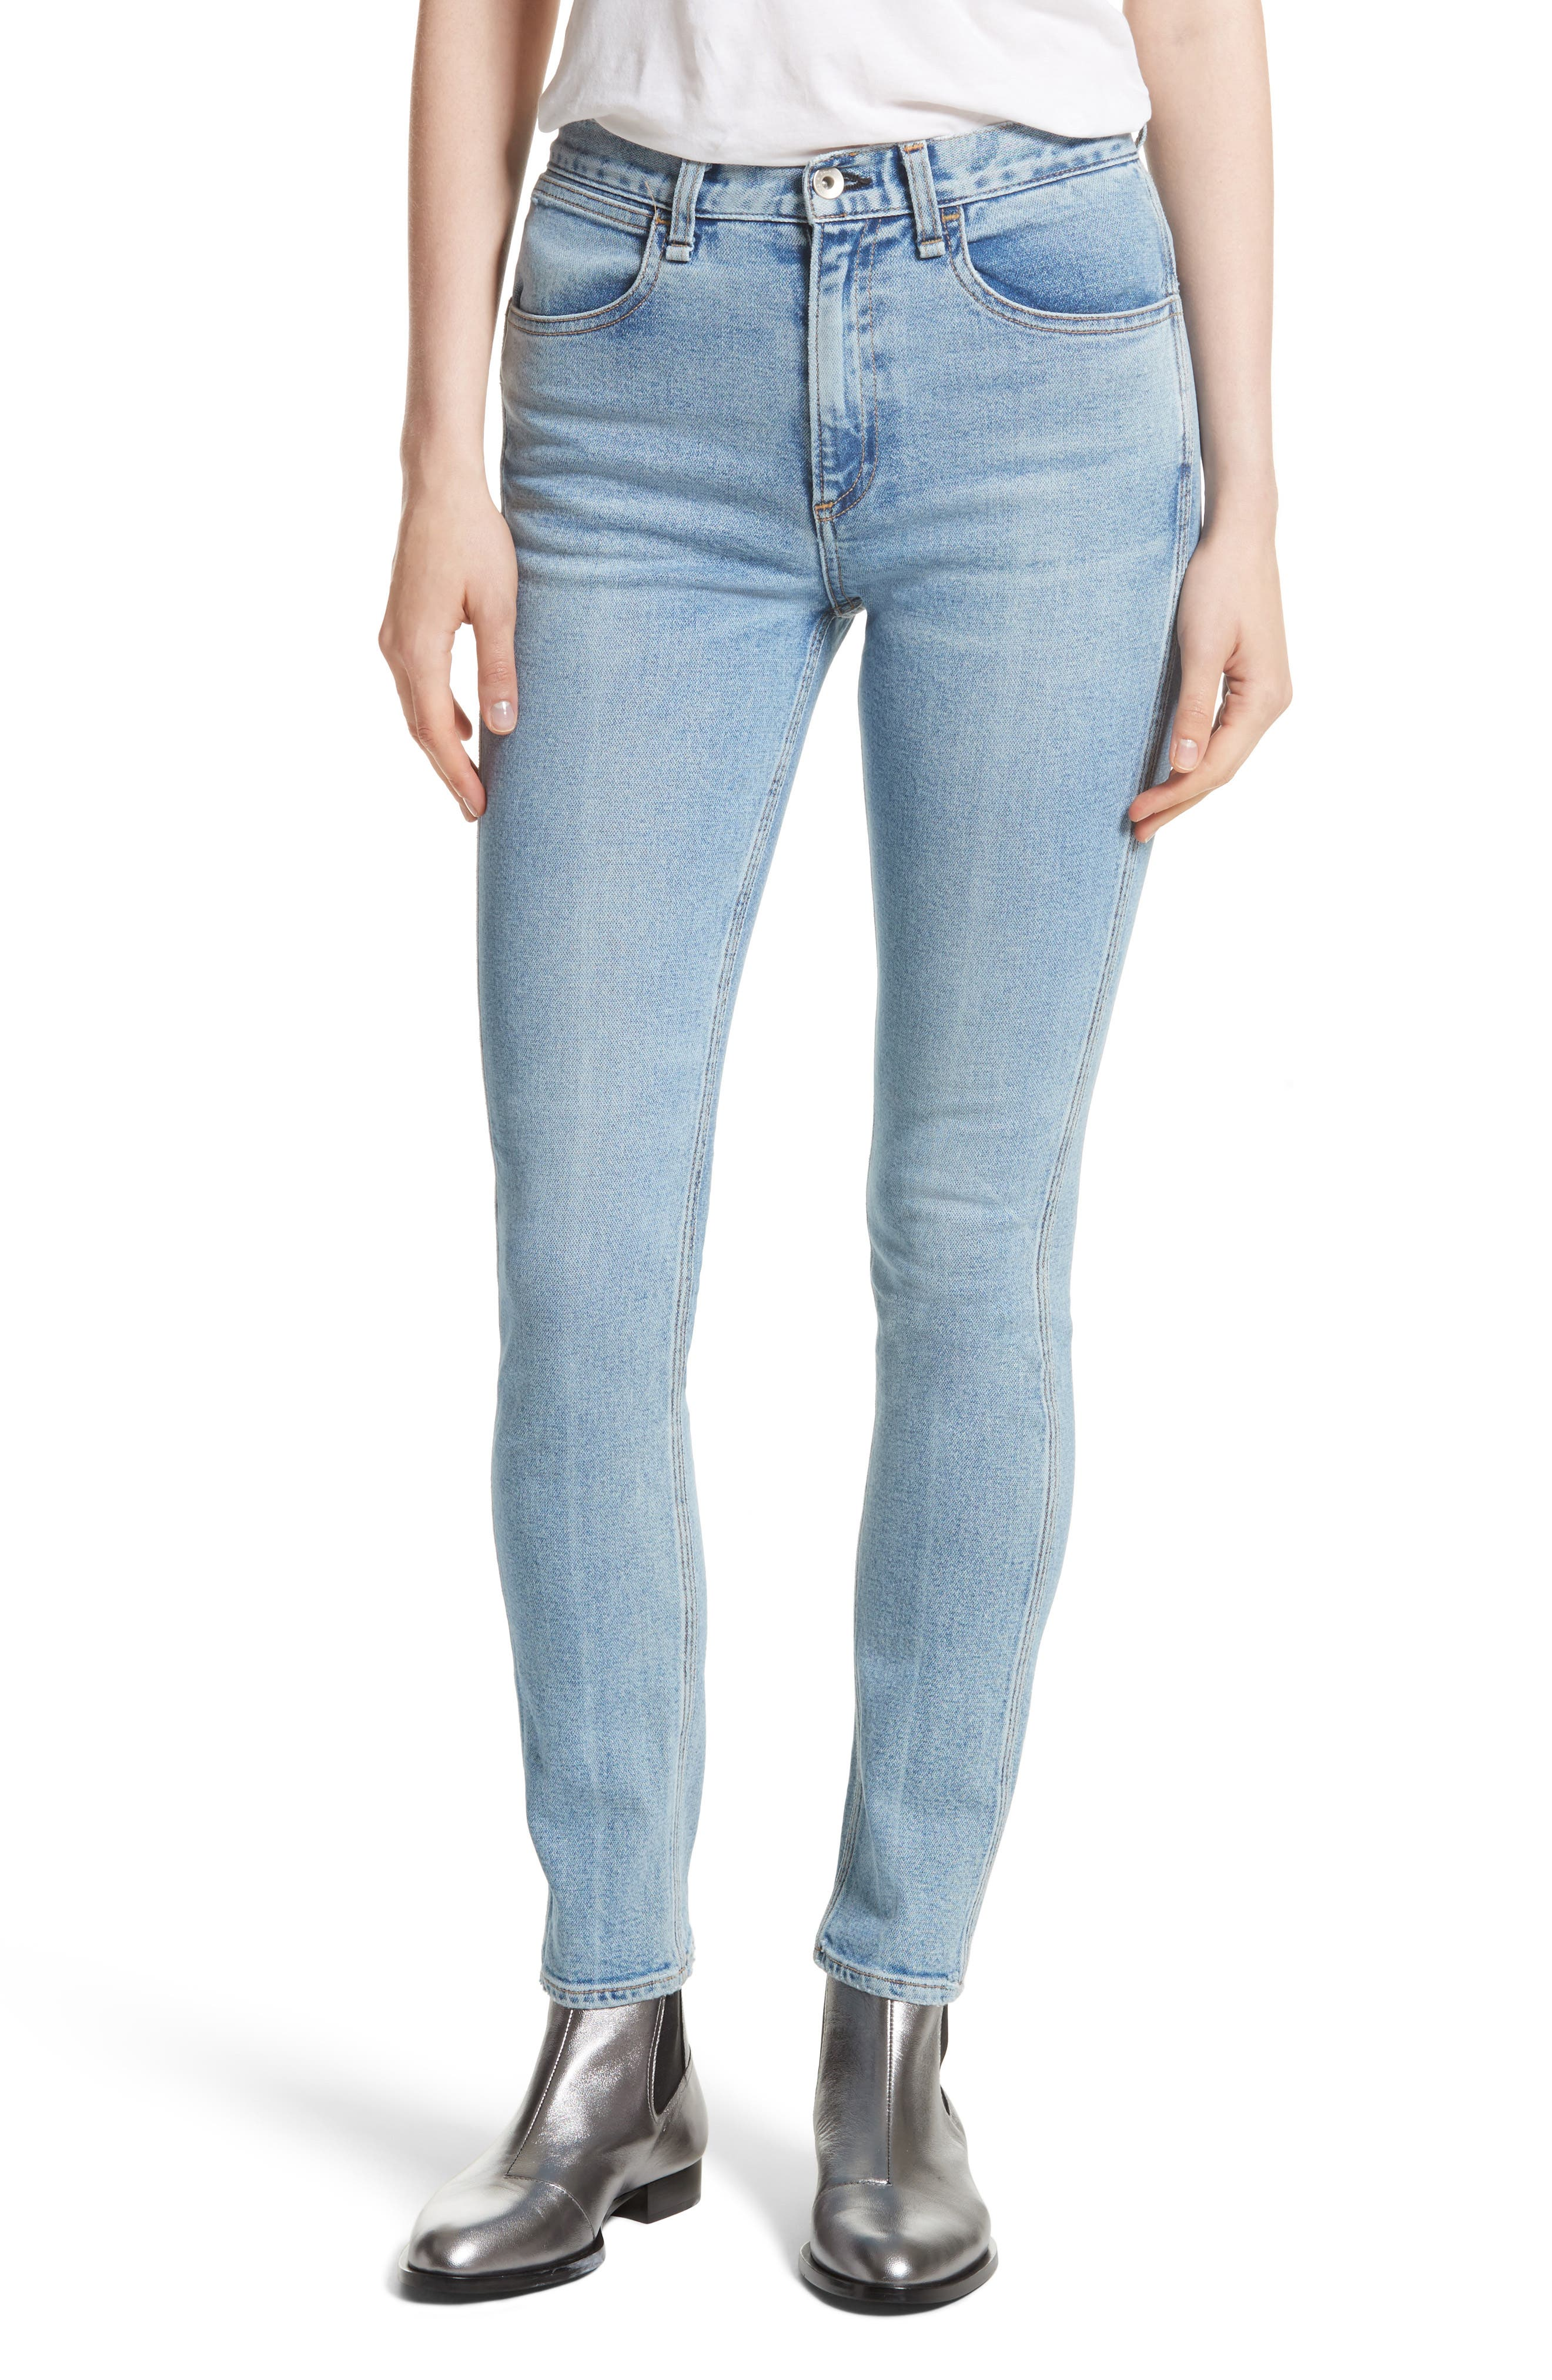 Alternate Image 1 Selected - rag & bone/JEAN Lou High Waist Skinny Jeans (Hotbird)